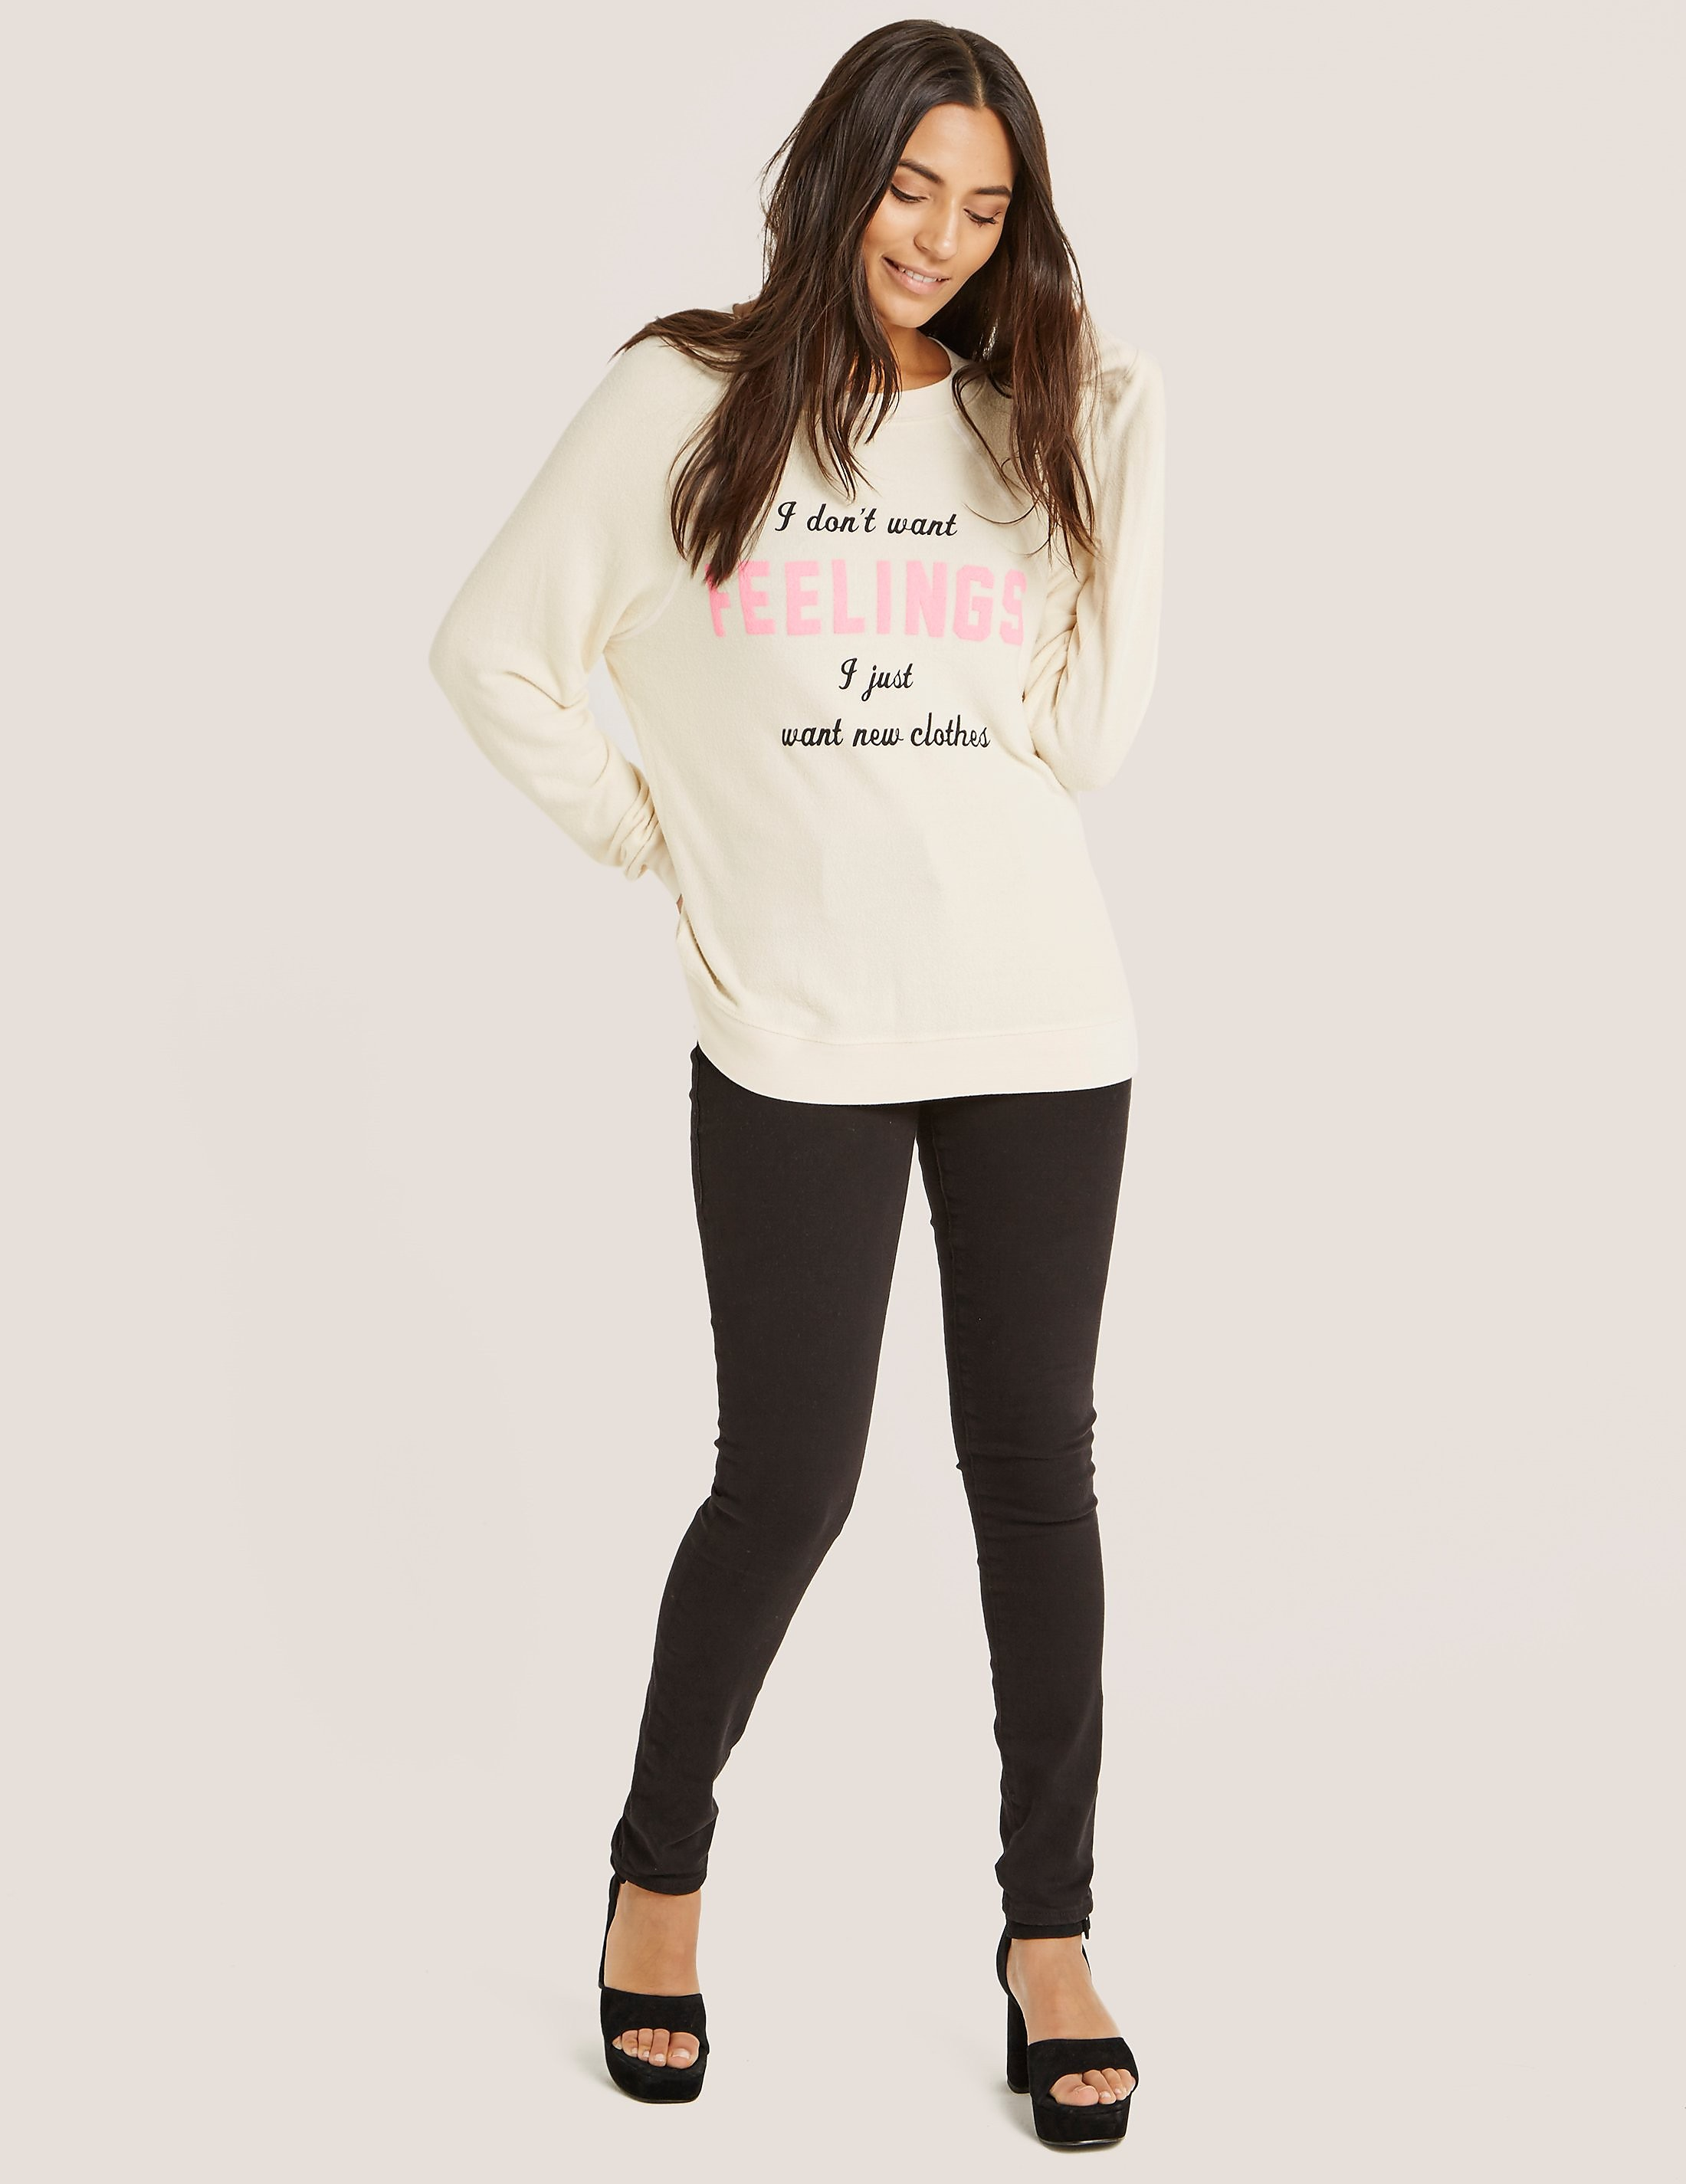 Wildfox New Clothes Sweatshirt